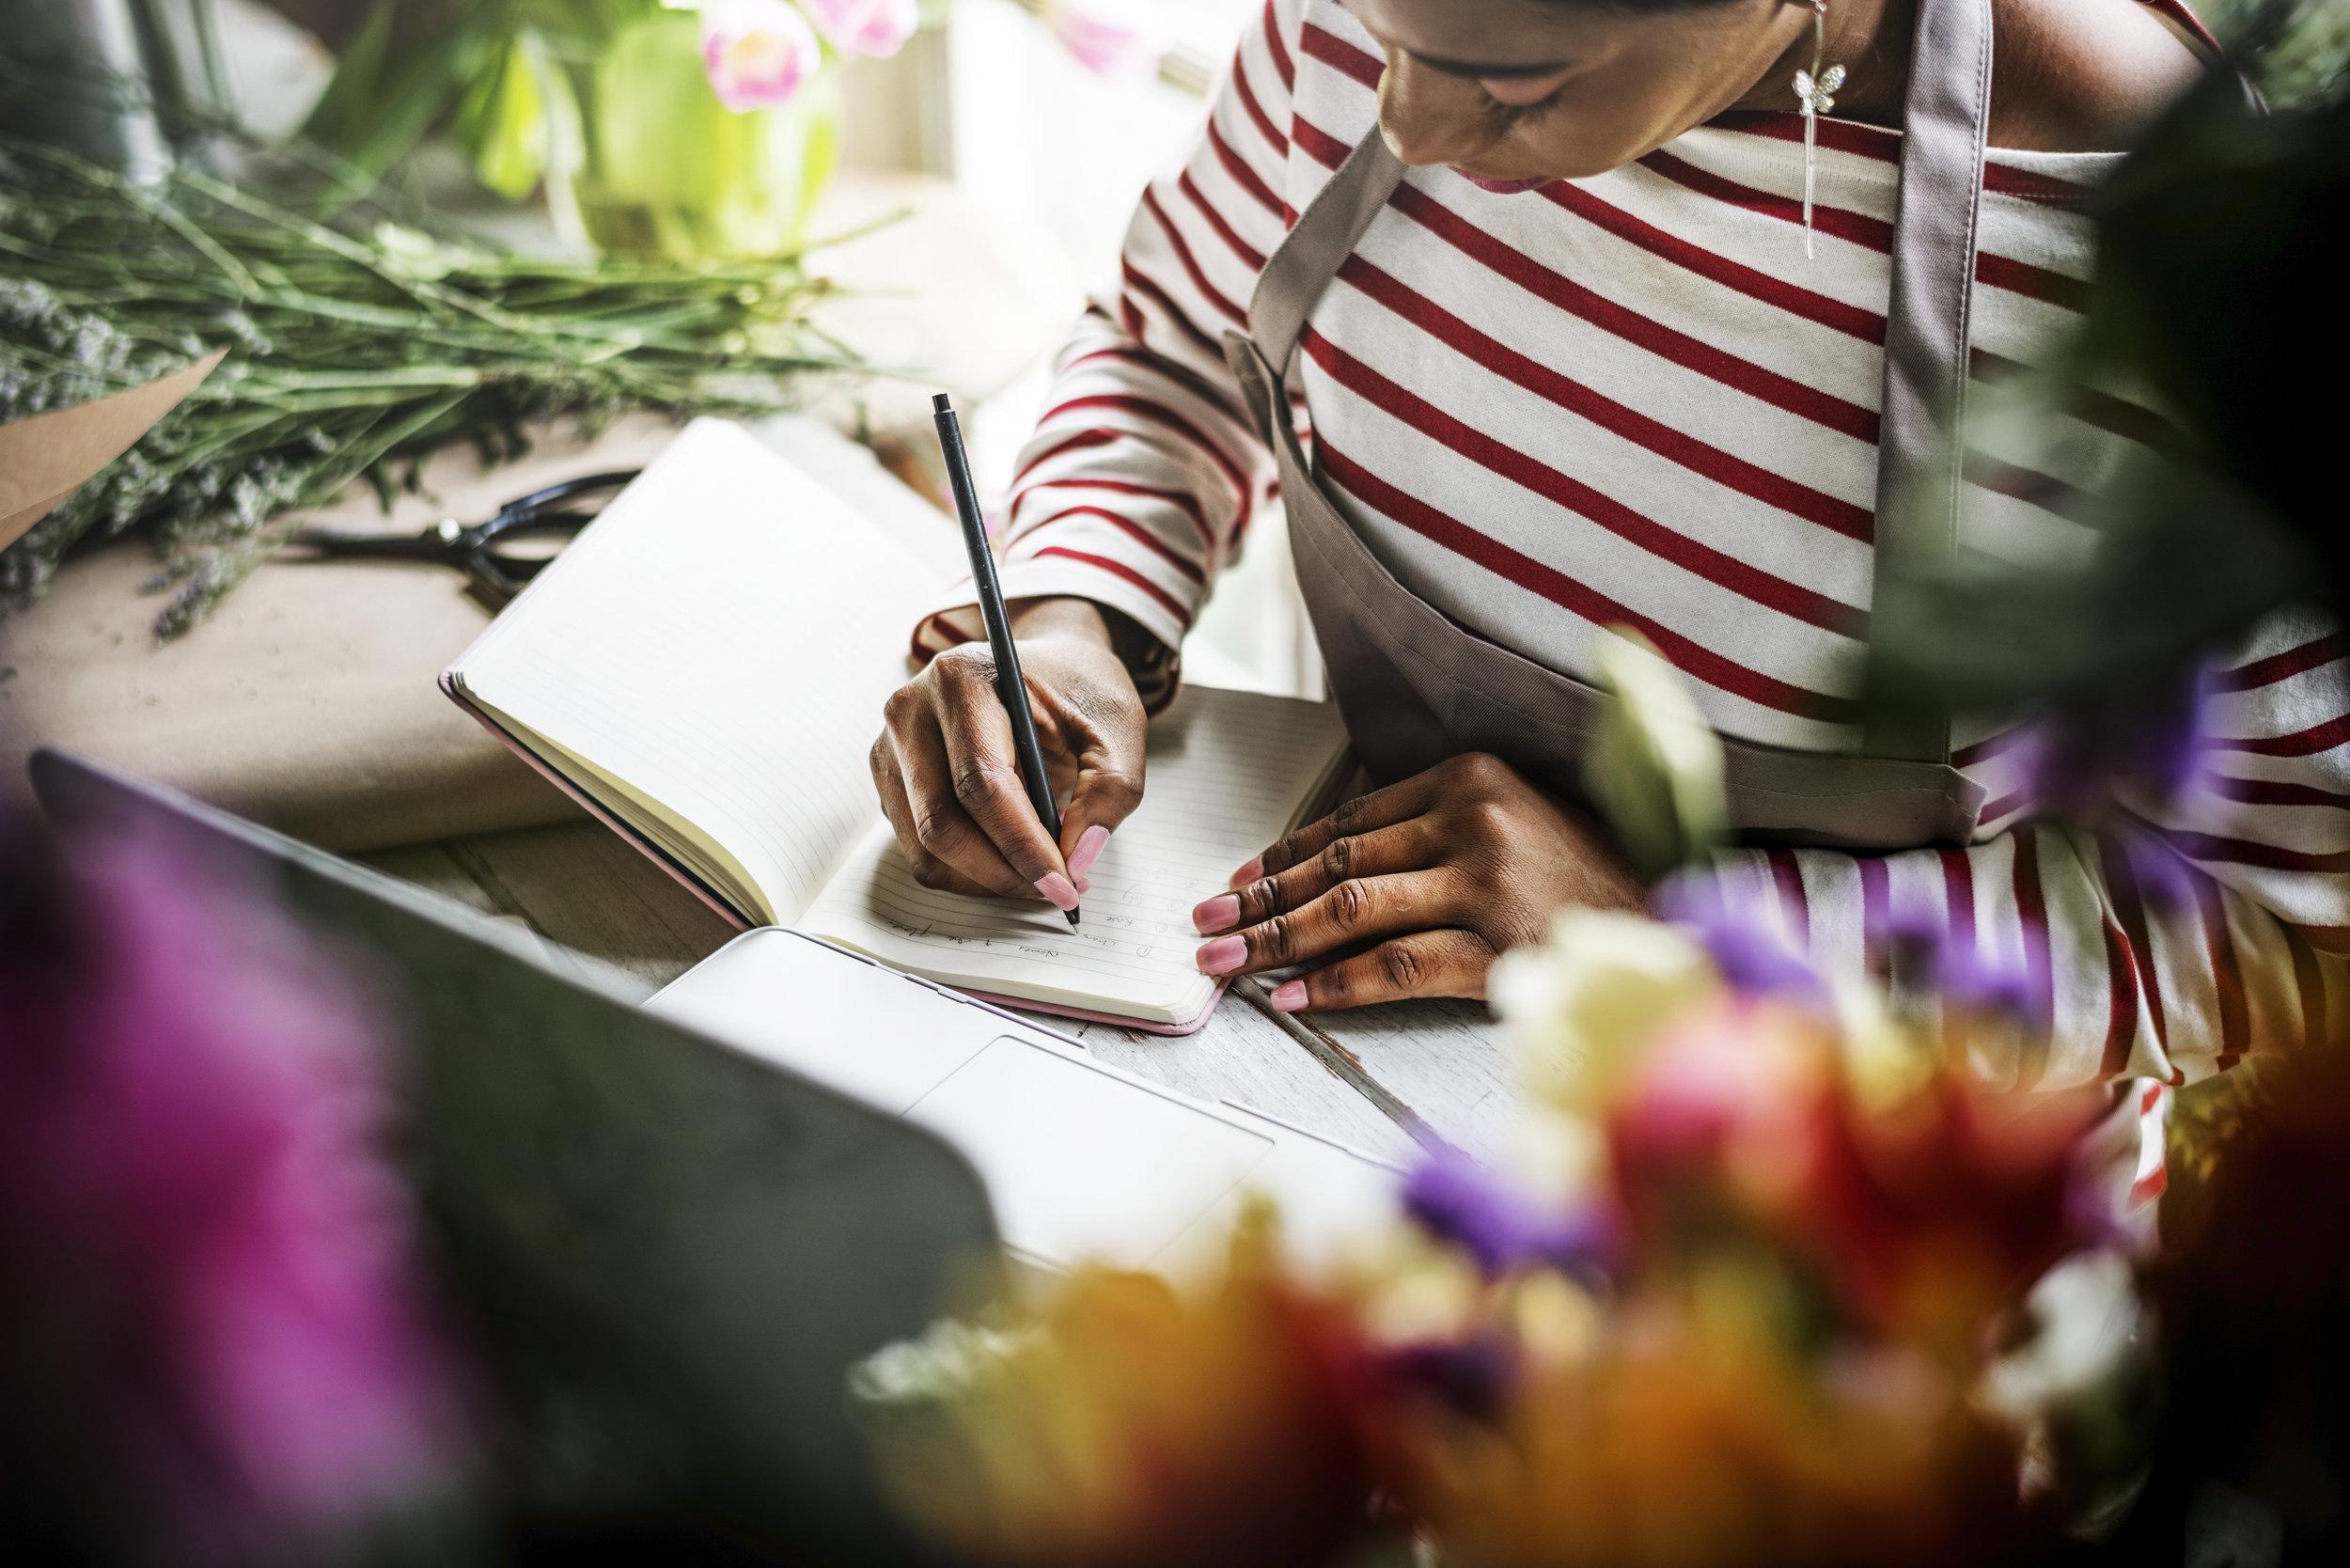 woman-sitting-writing-on-notebook-in-flower-shop-P7XFHGJ.jpg